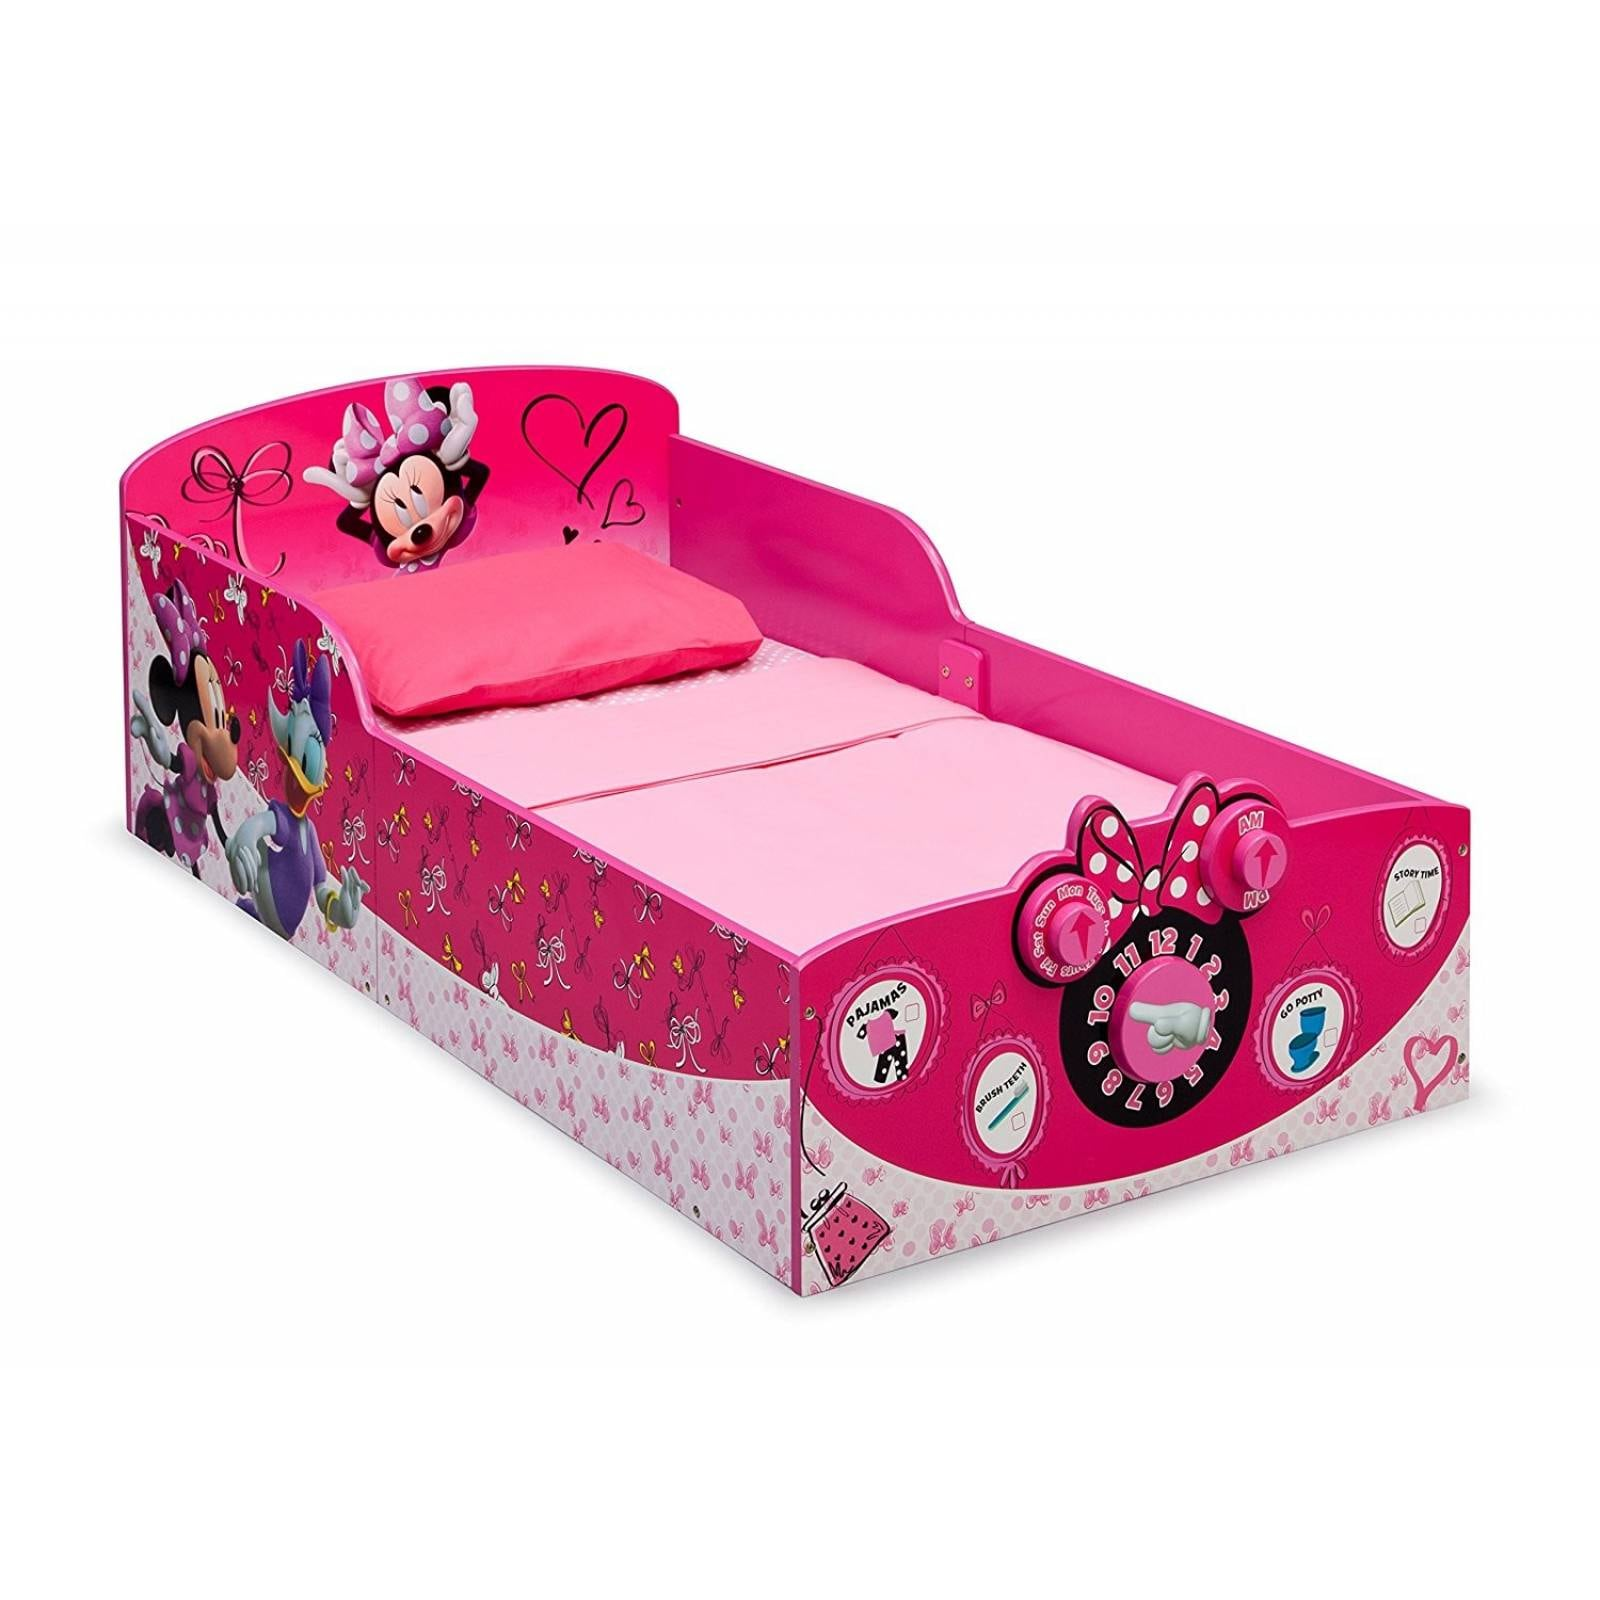 Cama Infantil Delta Children Minnie Mouse Hasta 22kg - Rosa